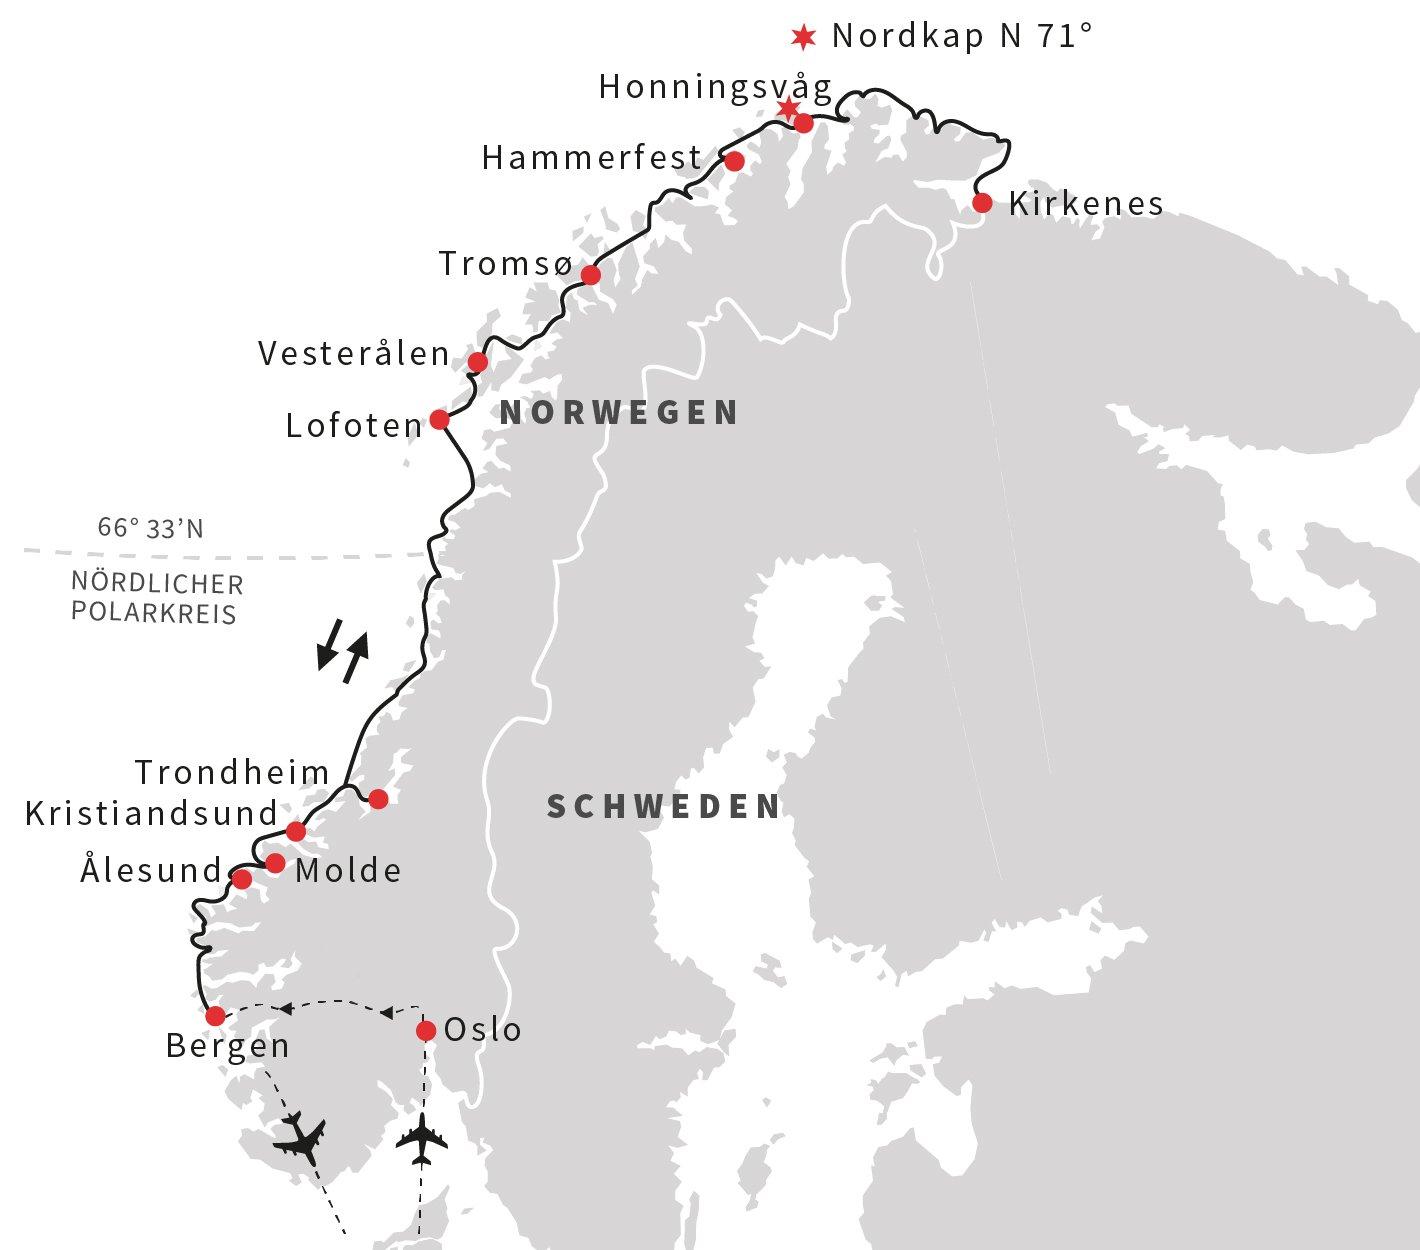 Maritimes Norwegen -  Hurtigruten und Telemarkkanal